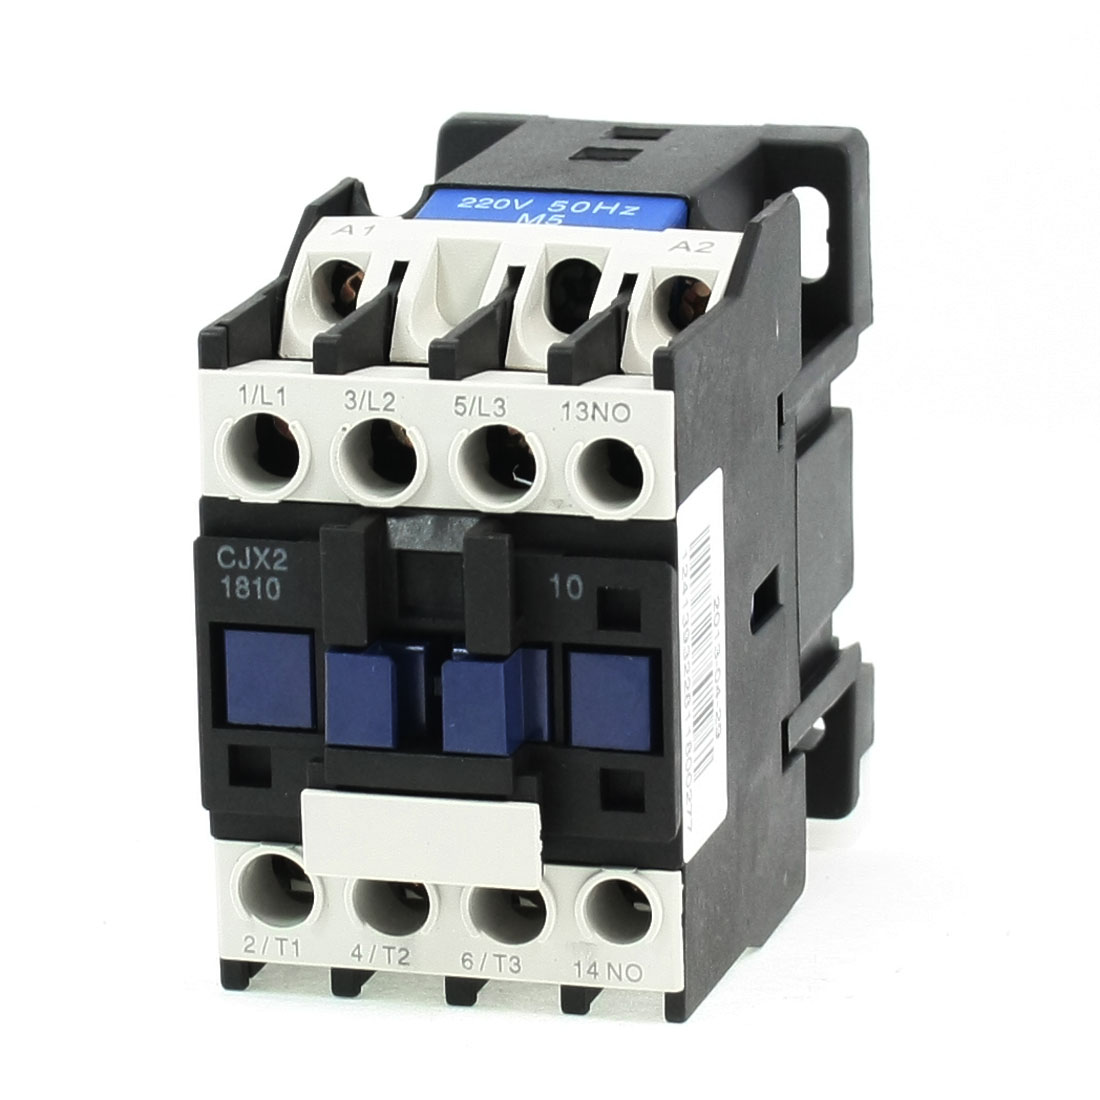 690V 3 Phase 3P N/C AC Contactor DIN Rail Mount 220V Coil CJX2-1810